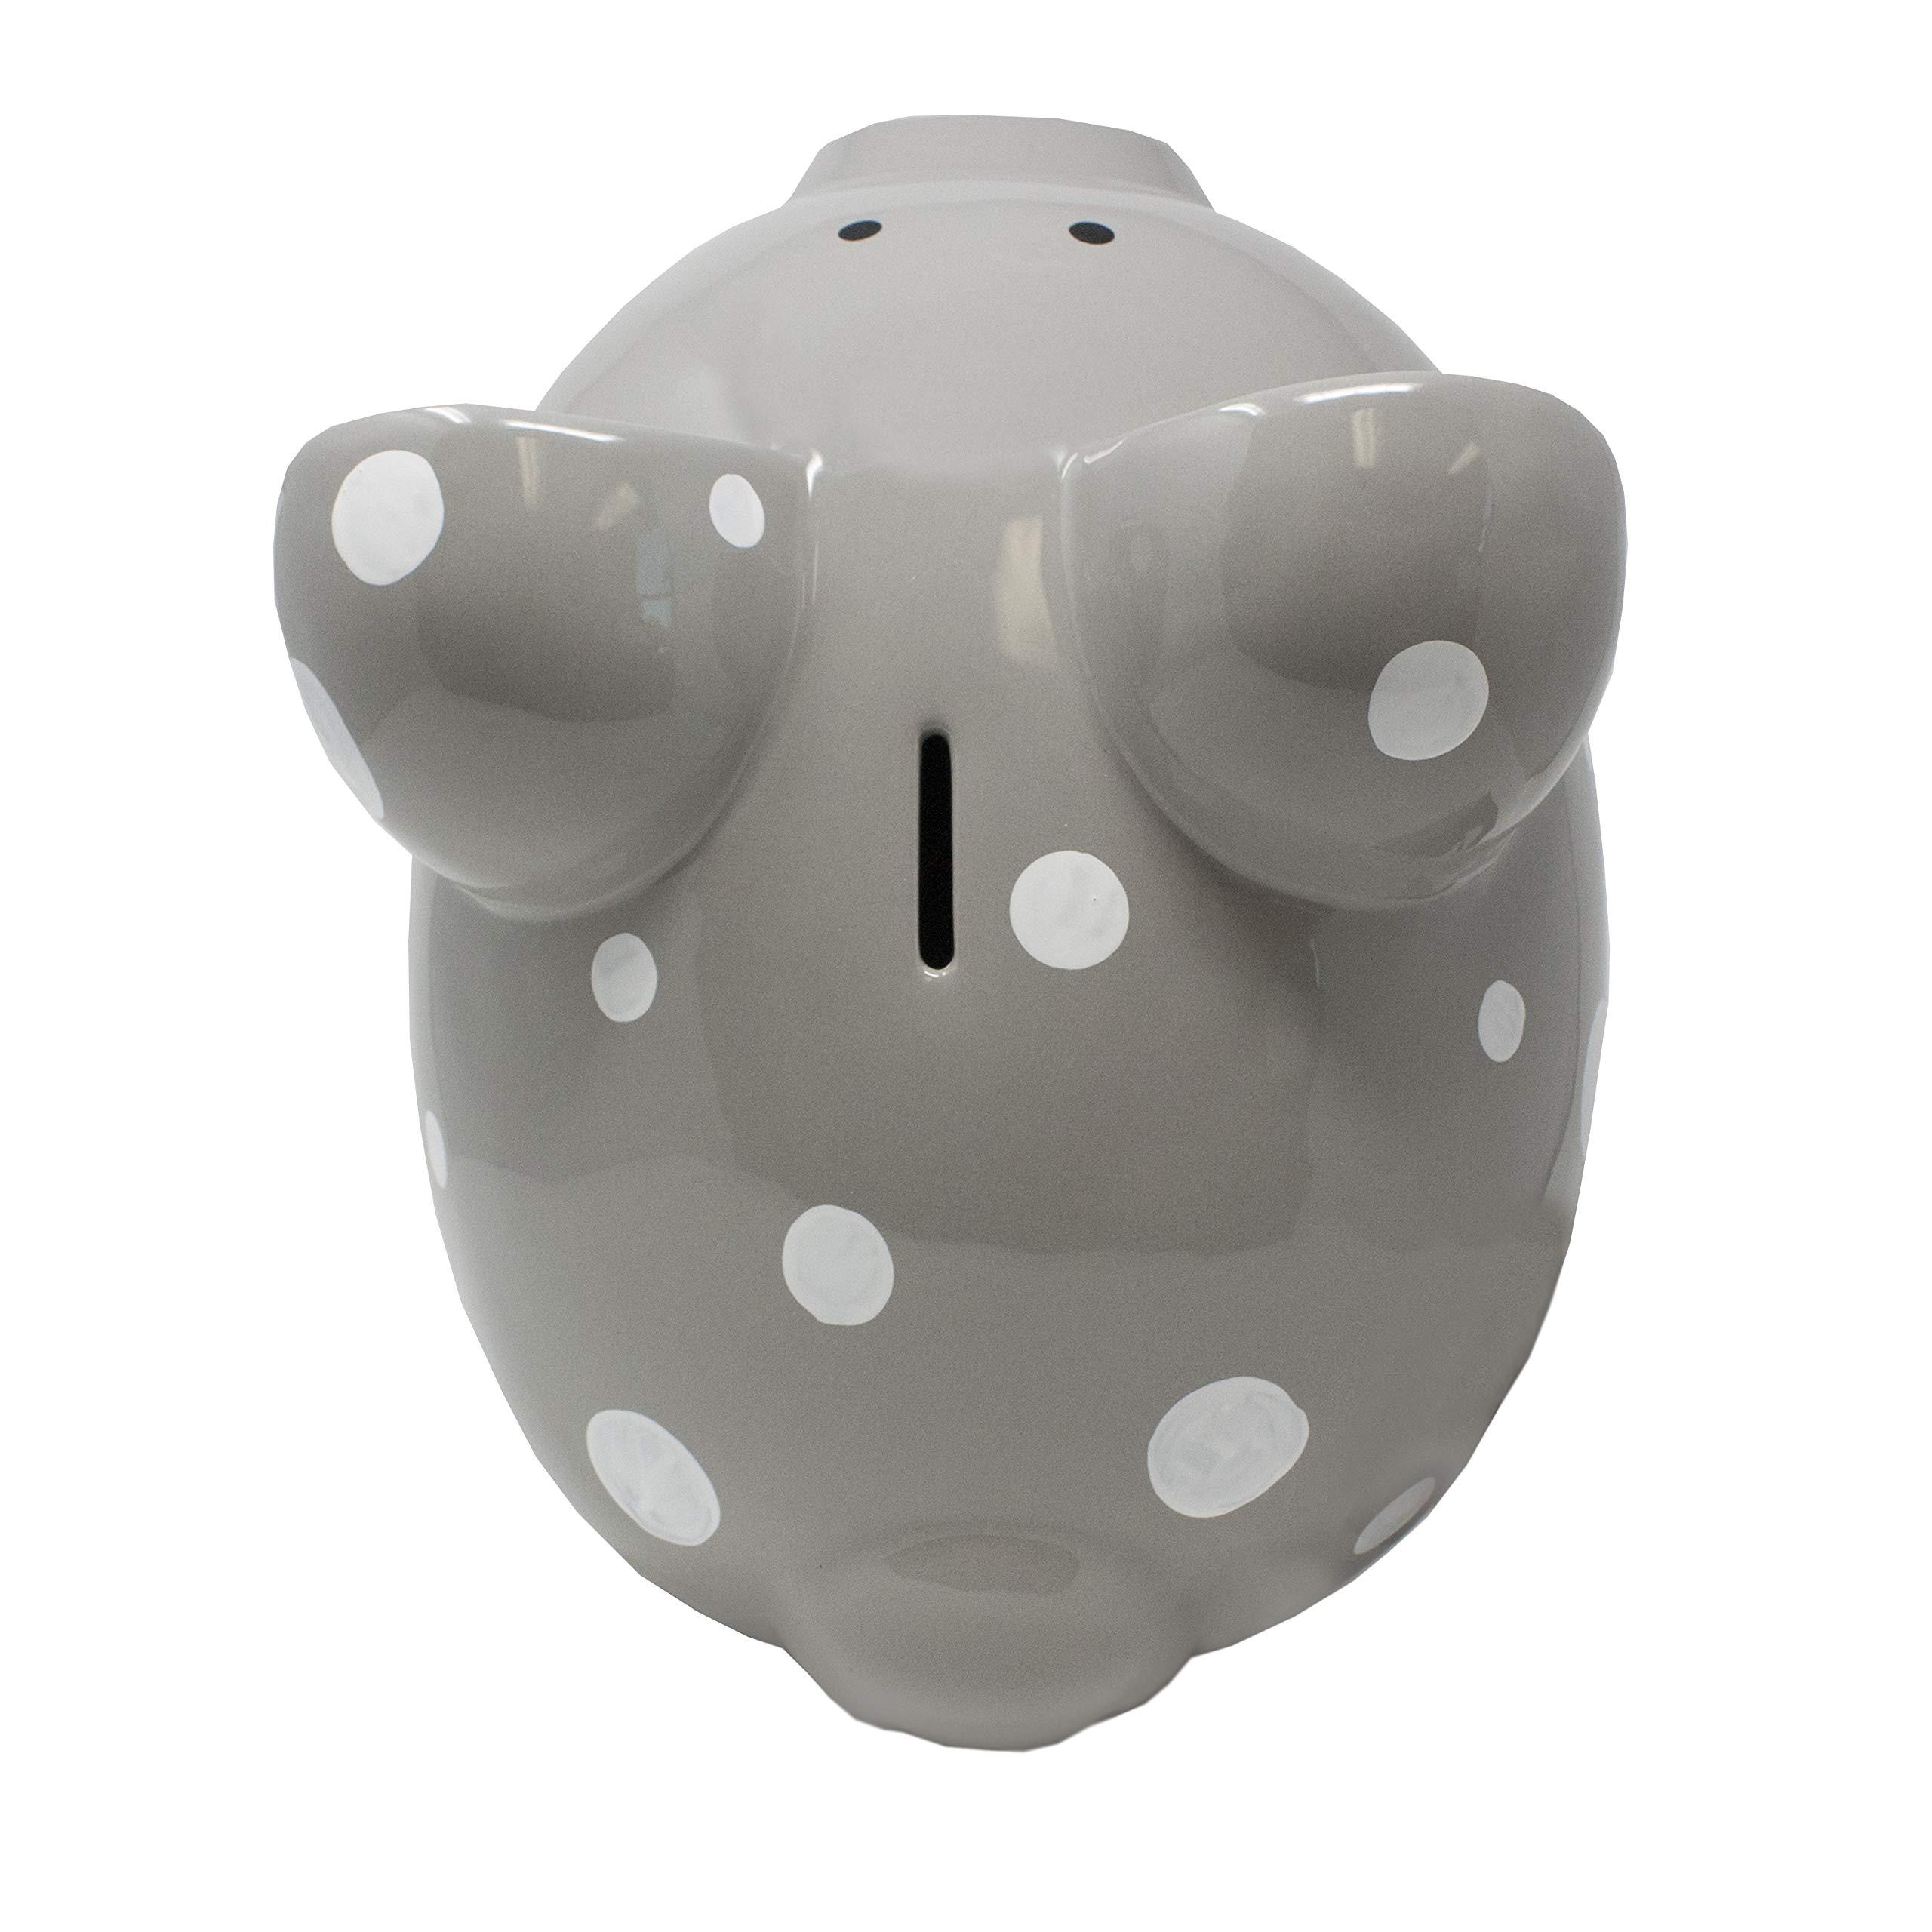 Child to Cherish Large Ceramic Boss Piggy Bank, Gray Polka Dot by Child to Cherish (Image #6)